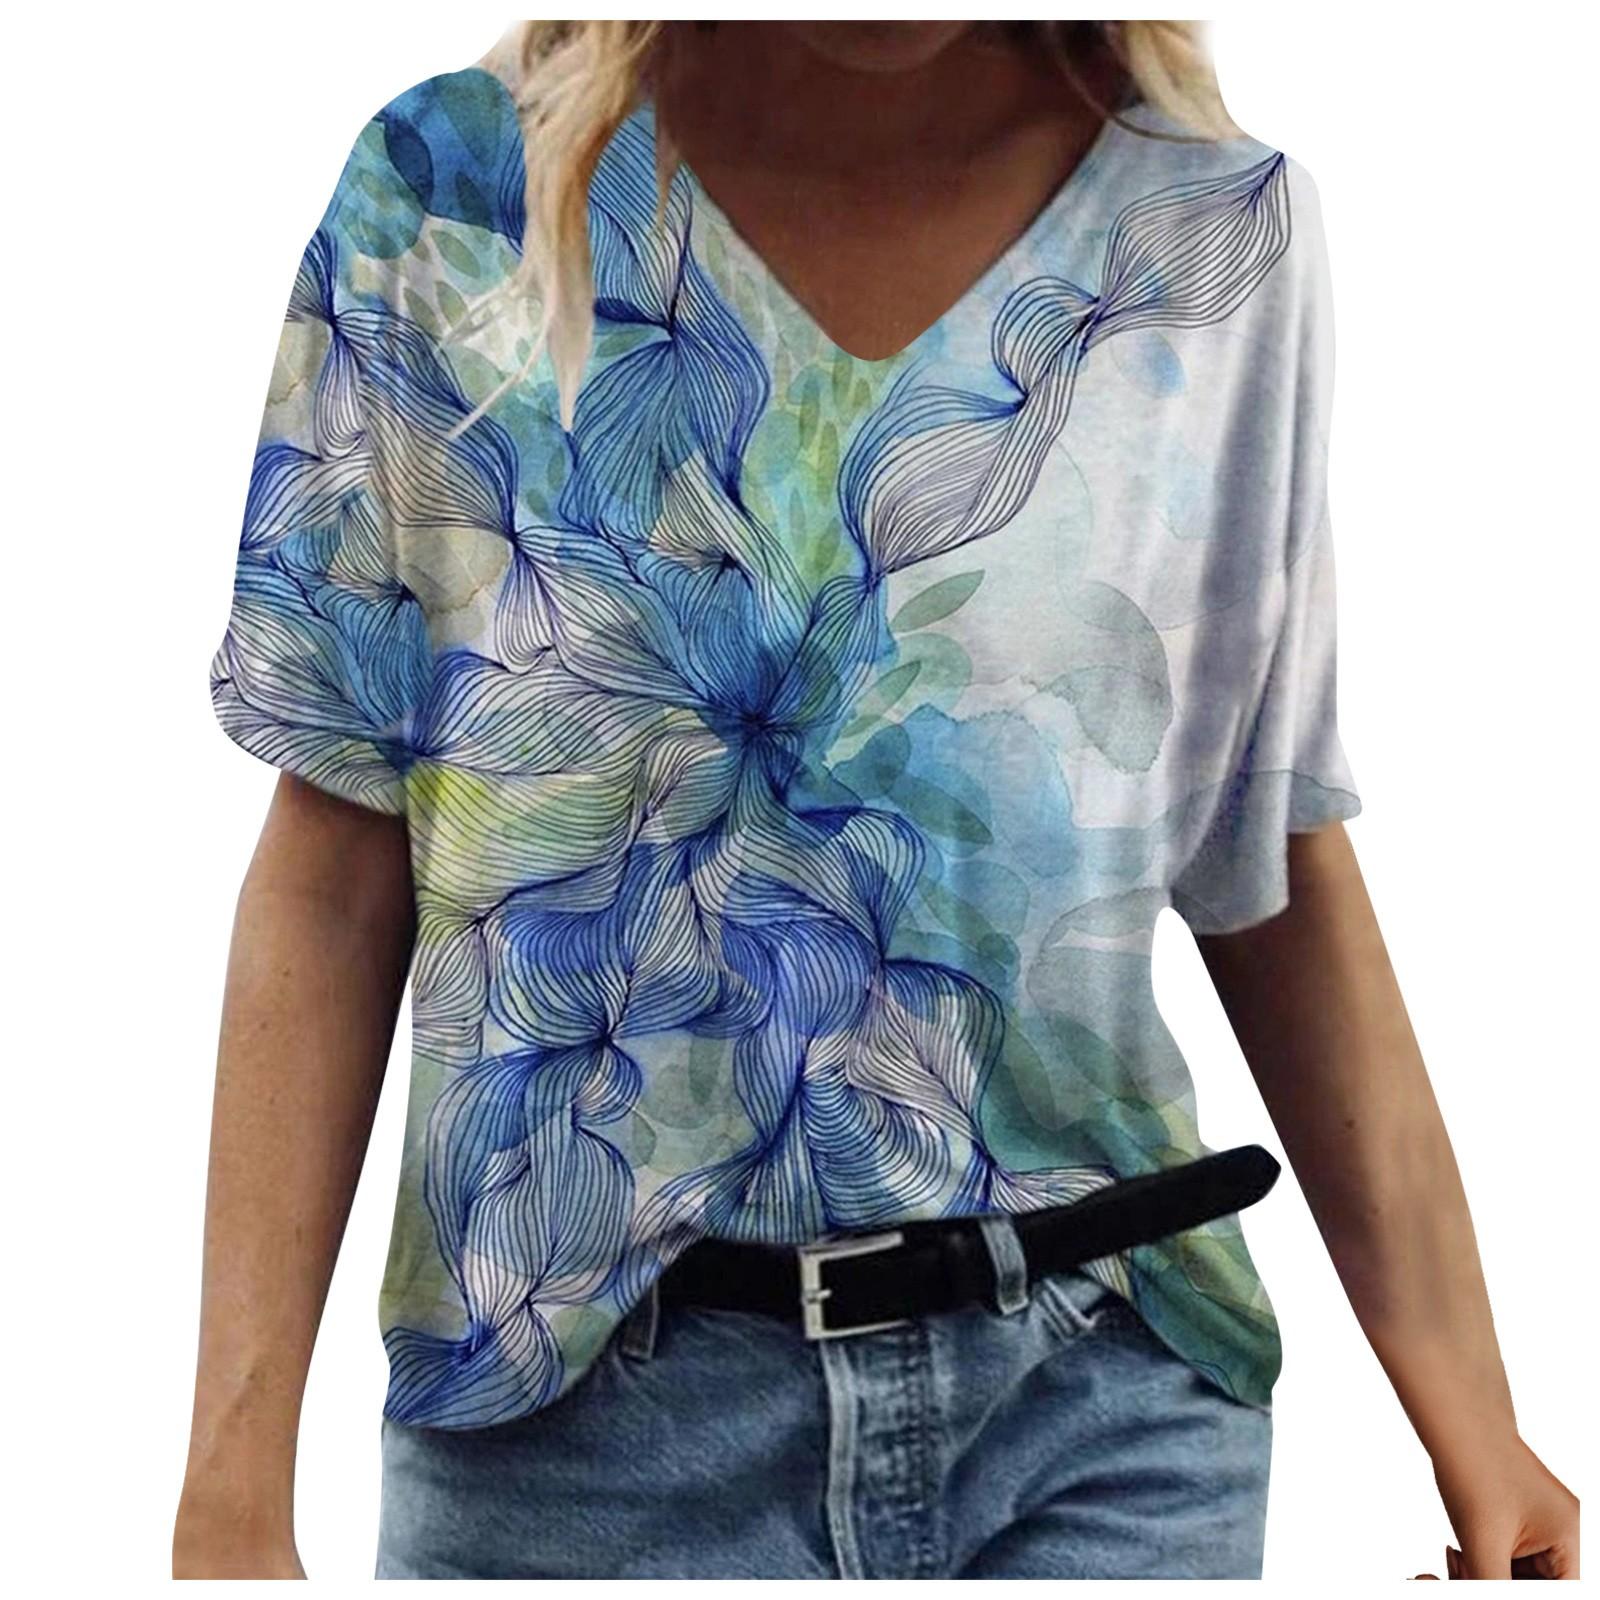 flower pattern Blouses Plus Size Women Short Sleeve Printed Shirts V Neck blusas mujer manga corta young beauty shirts blusas